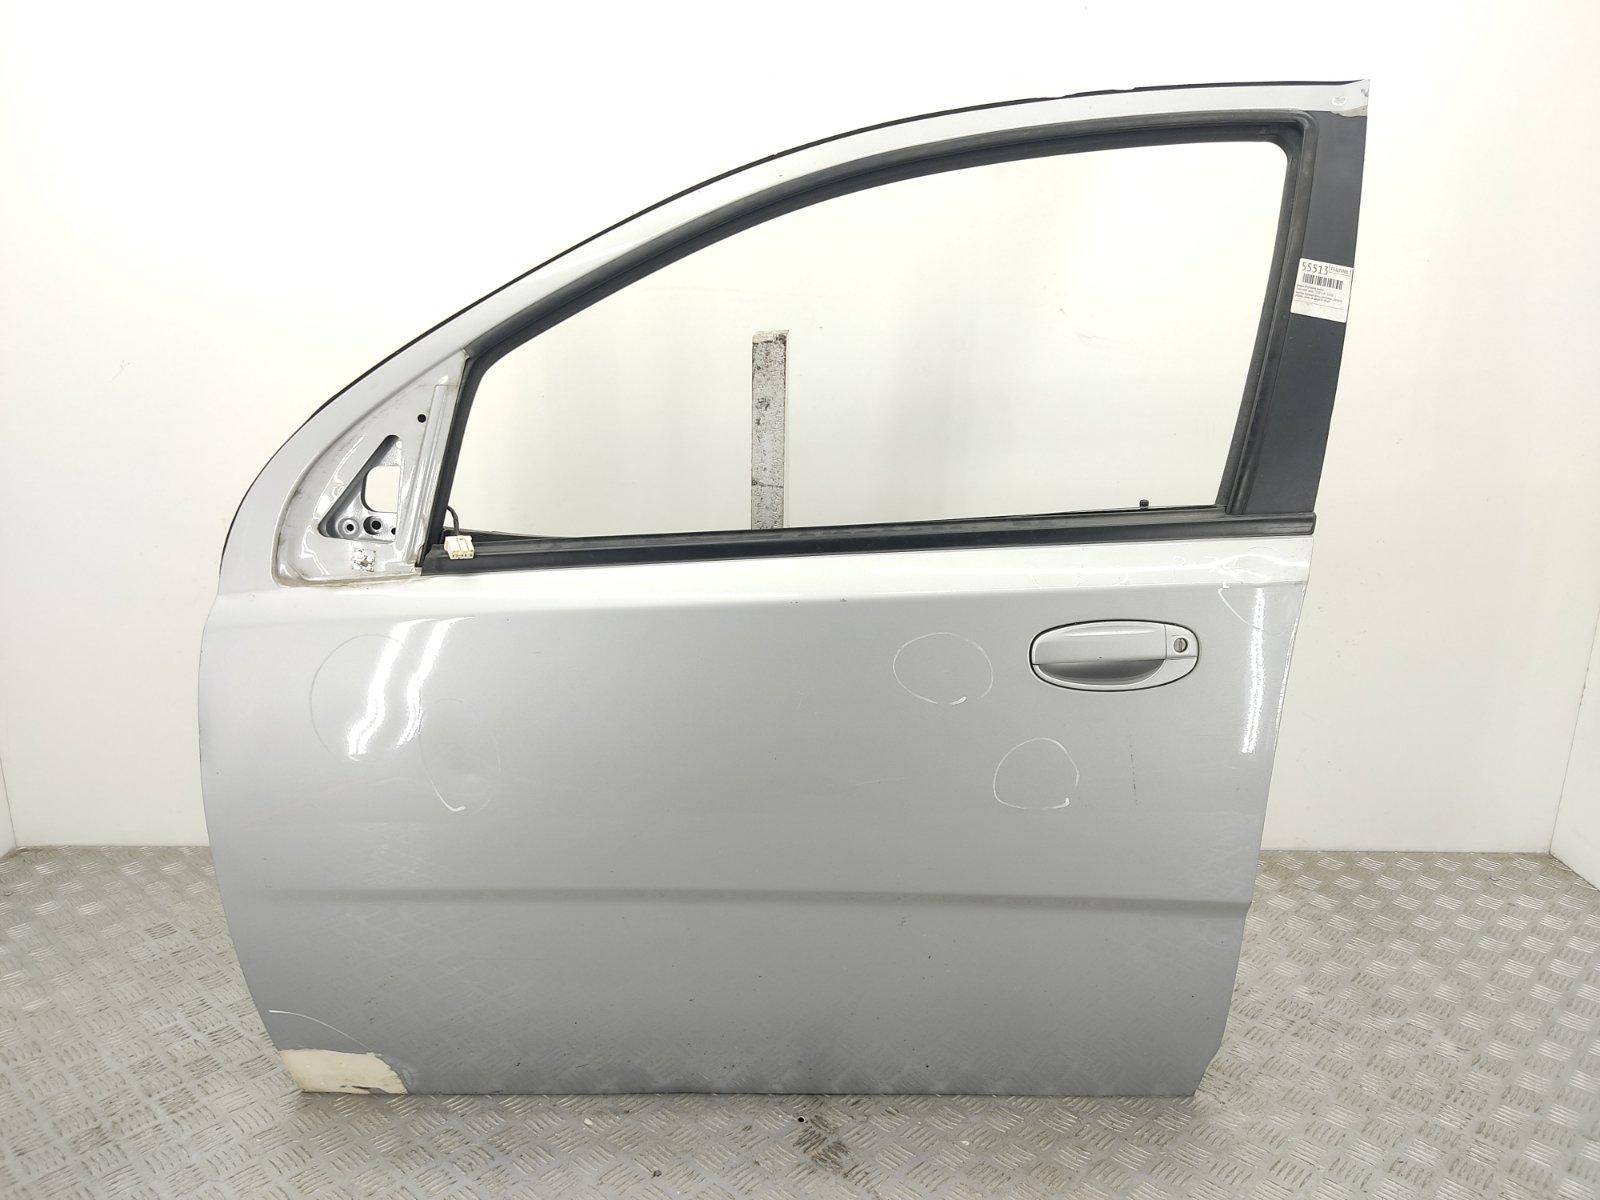 Дверь передняя левая Chevrolet Aveo T250 1.4 I 2010 (б/у)